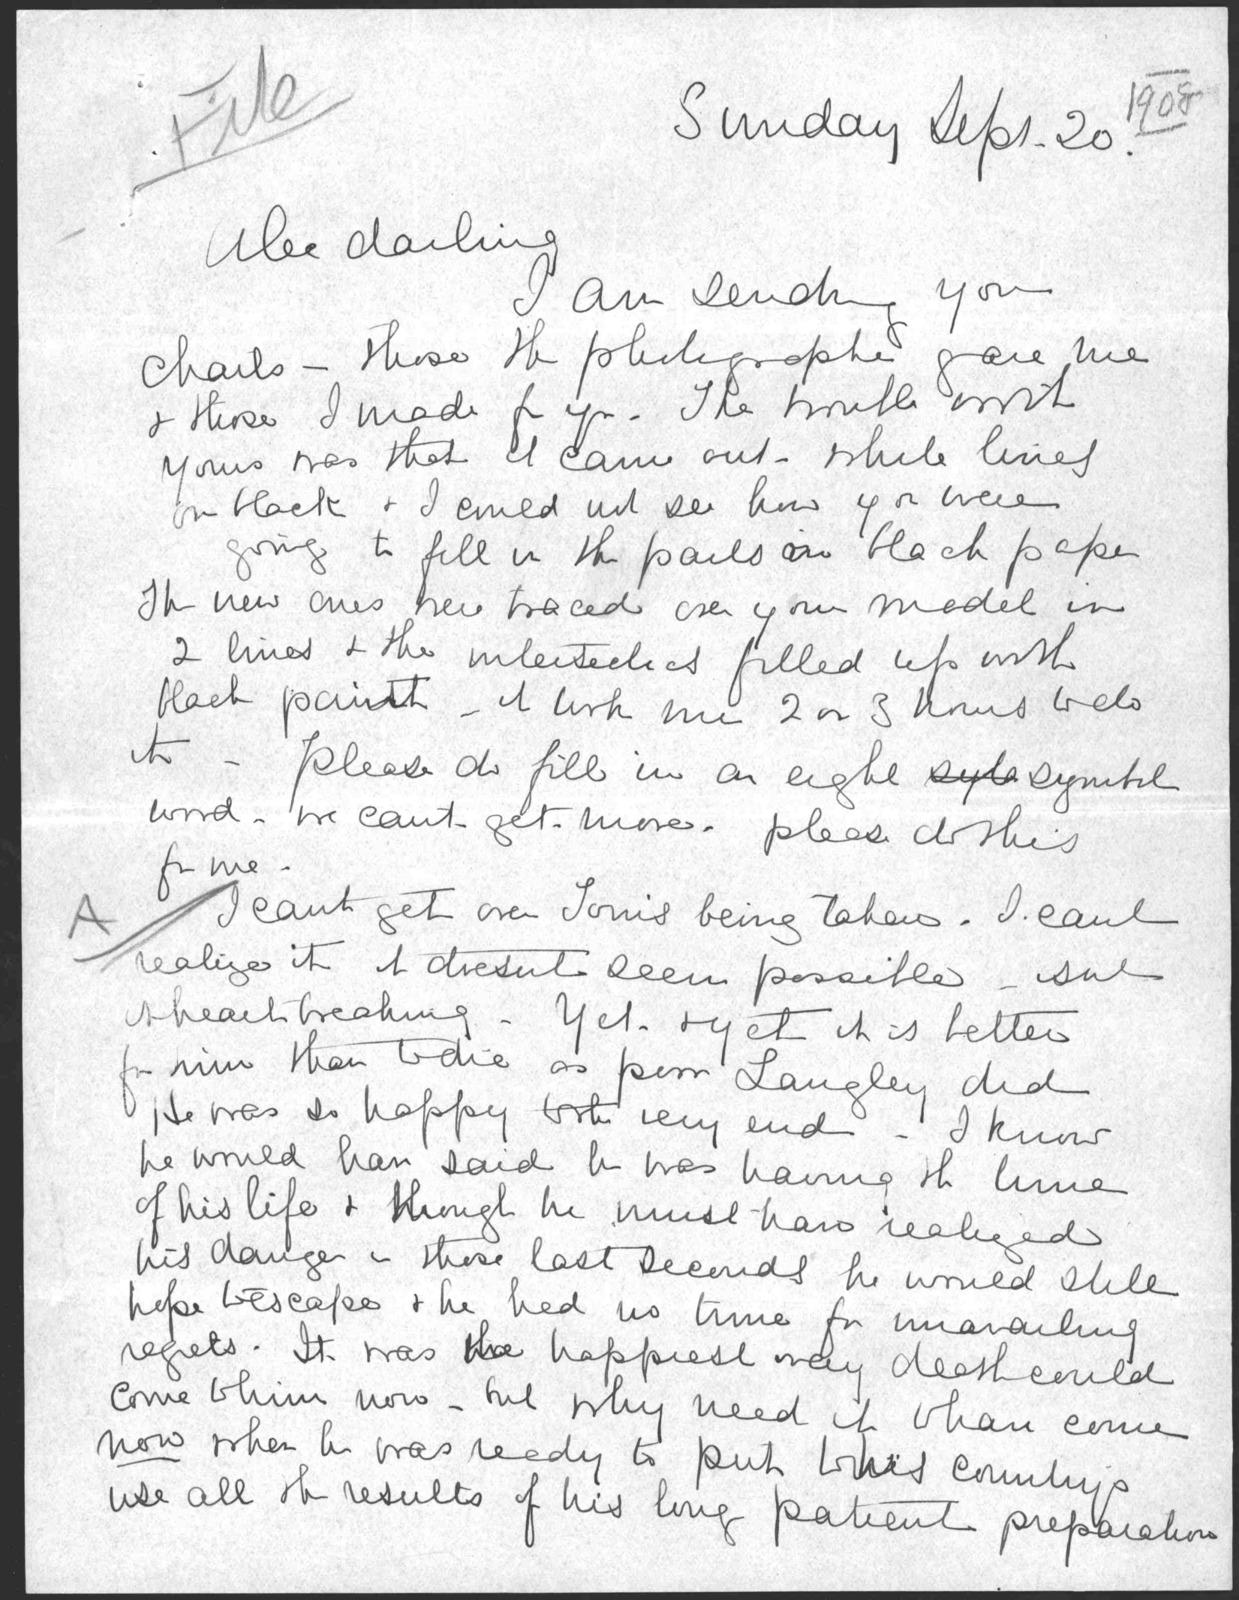 Letter from Mabel Hubbard Bell to Alexander Graham Bell, September 20